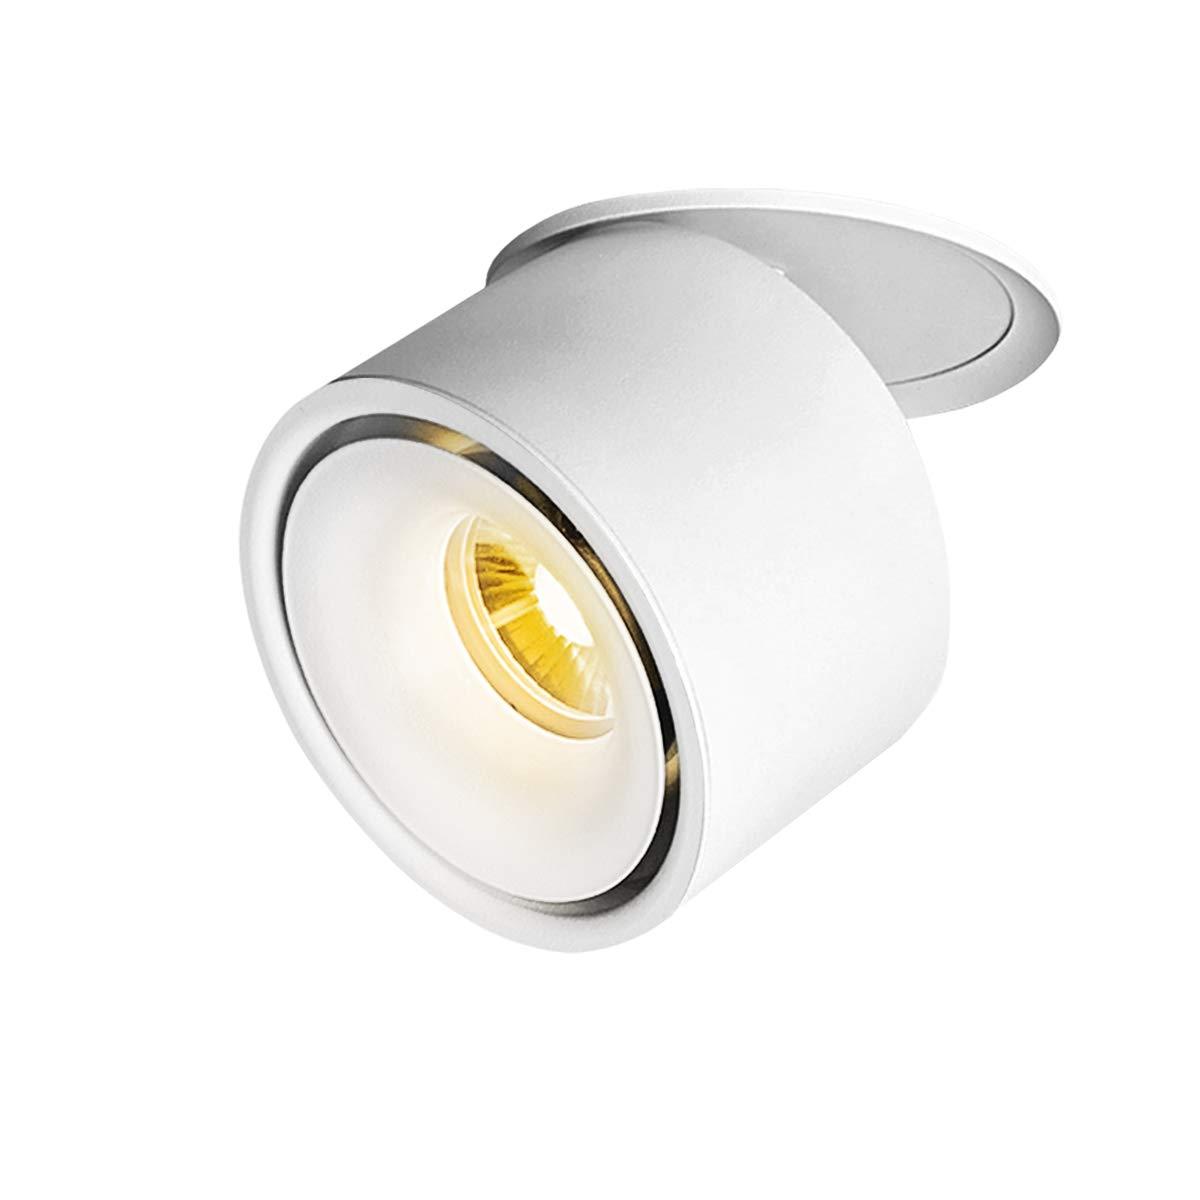 TOPMO Indoor 10W LED Ceiling Fixtures Recessed Ceiling Spotlights/360°Adjustable Ceiling Downlight/10X8CM/Aluminum Spot Light (white3000K)